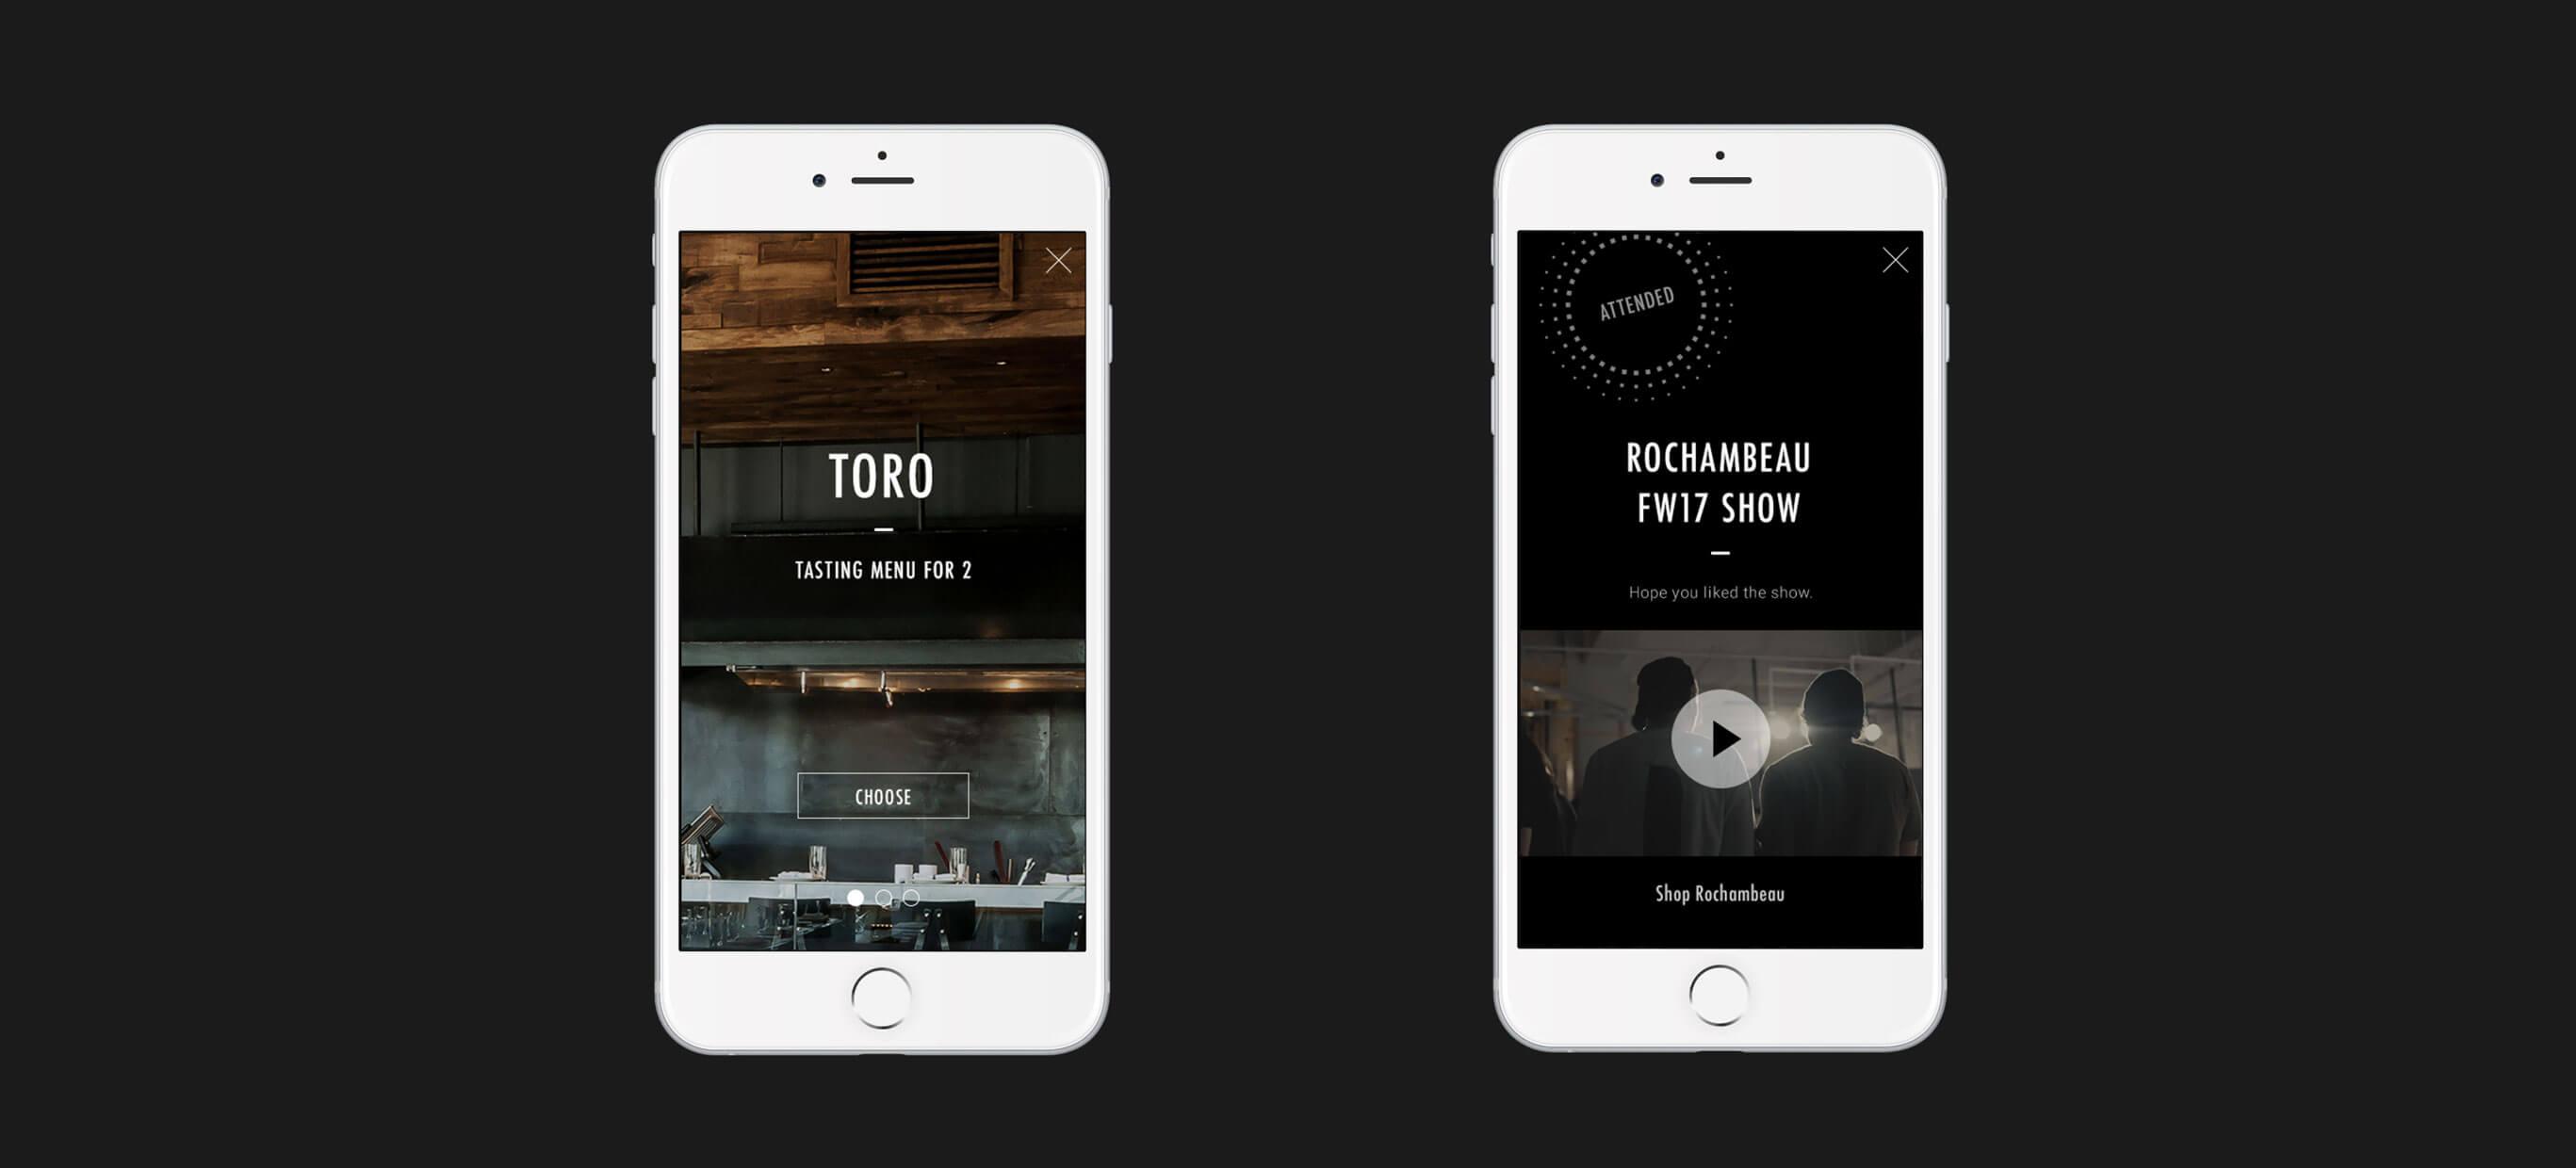 Rochambeau - Pixeled Eggs - Digital